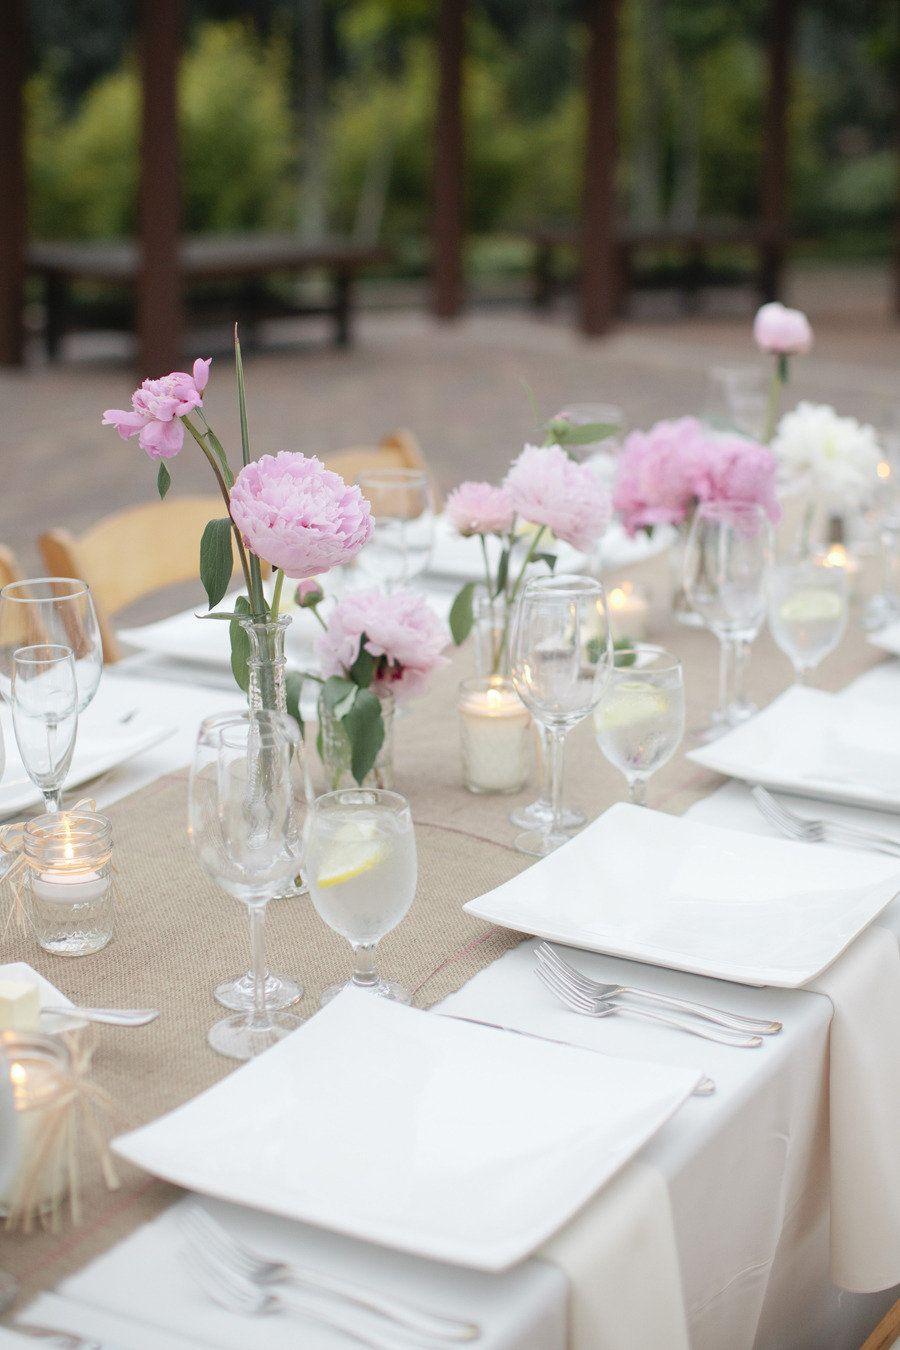 San Diego Wedding at Balboa Park by joielala photographie | Weddings ...